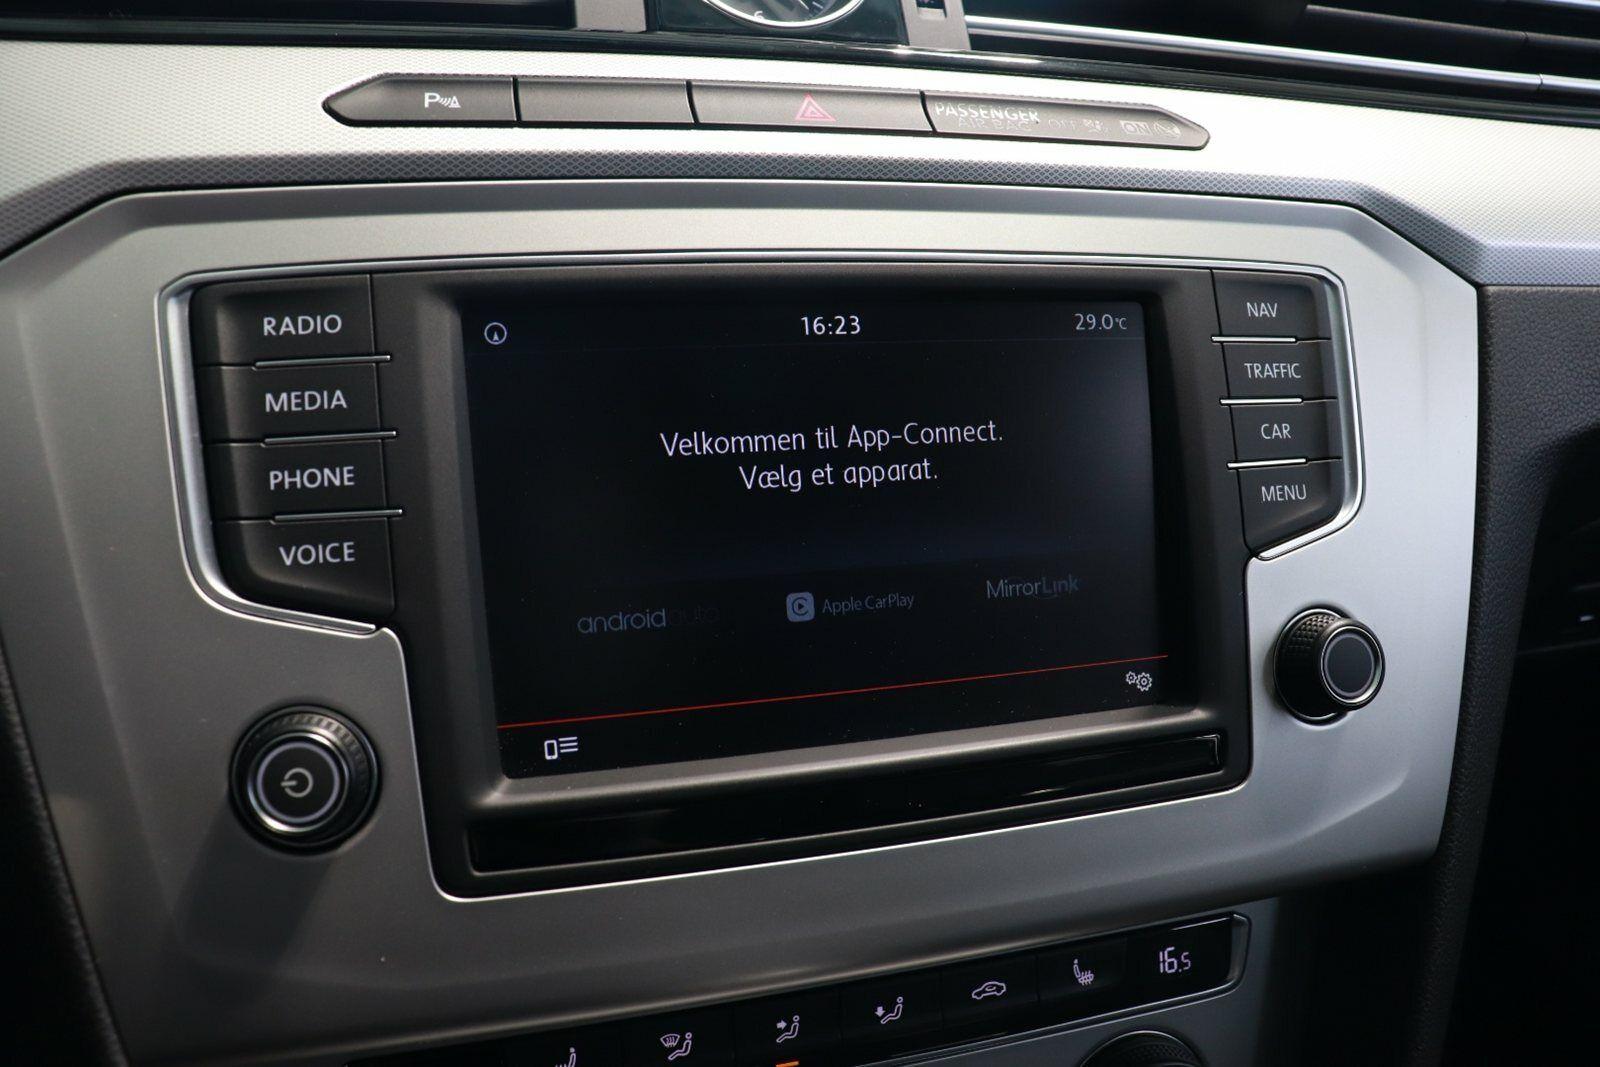 VW Passat TDi 150 Comfortline+ Vari. DSG